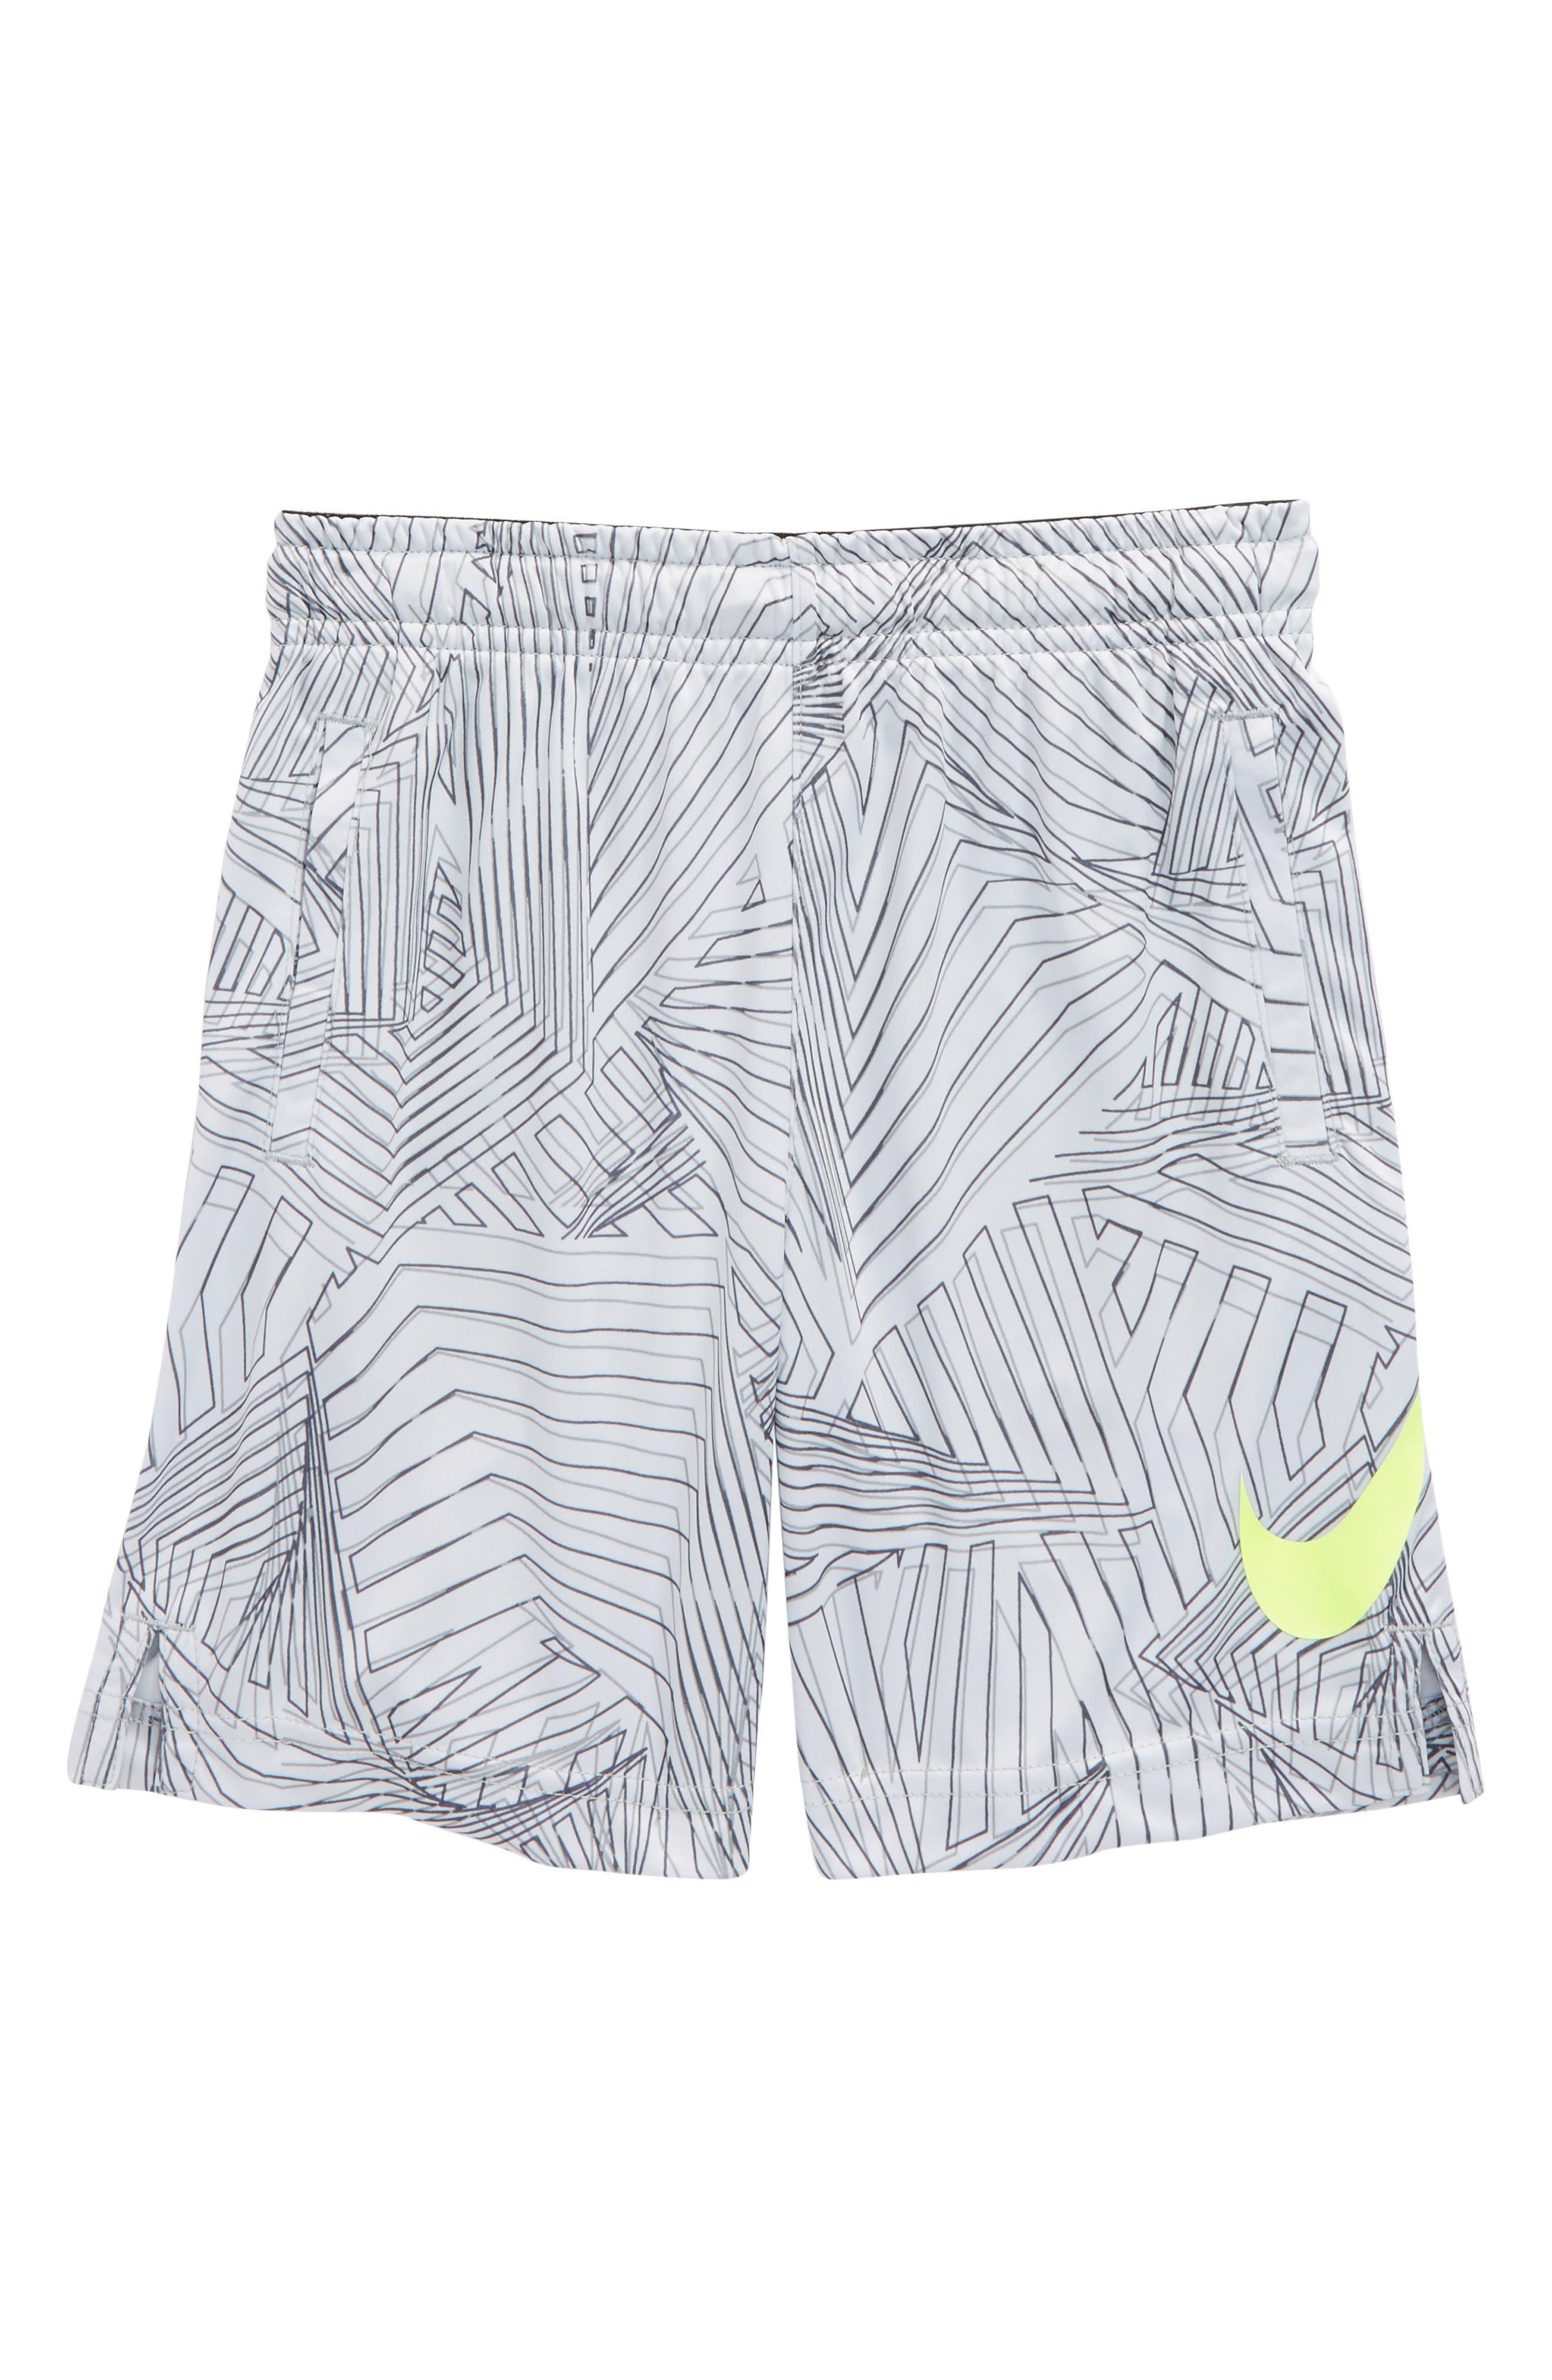 Alternate Image 1 Selected - Nike AOP Dry Shorts (Toddler Boys & Little Boys)